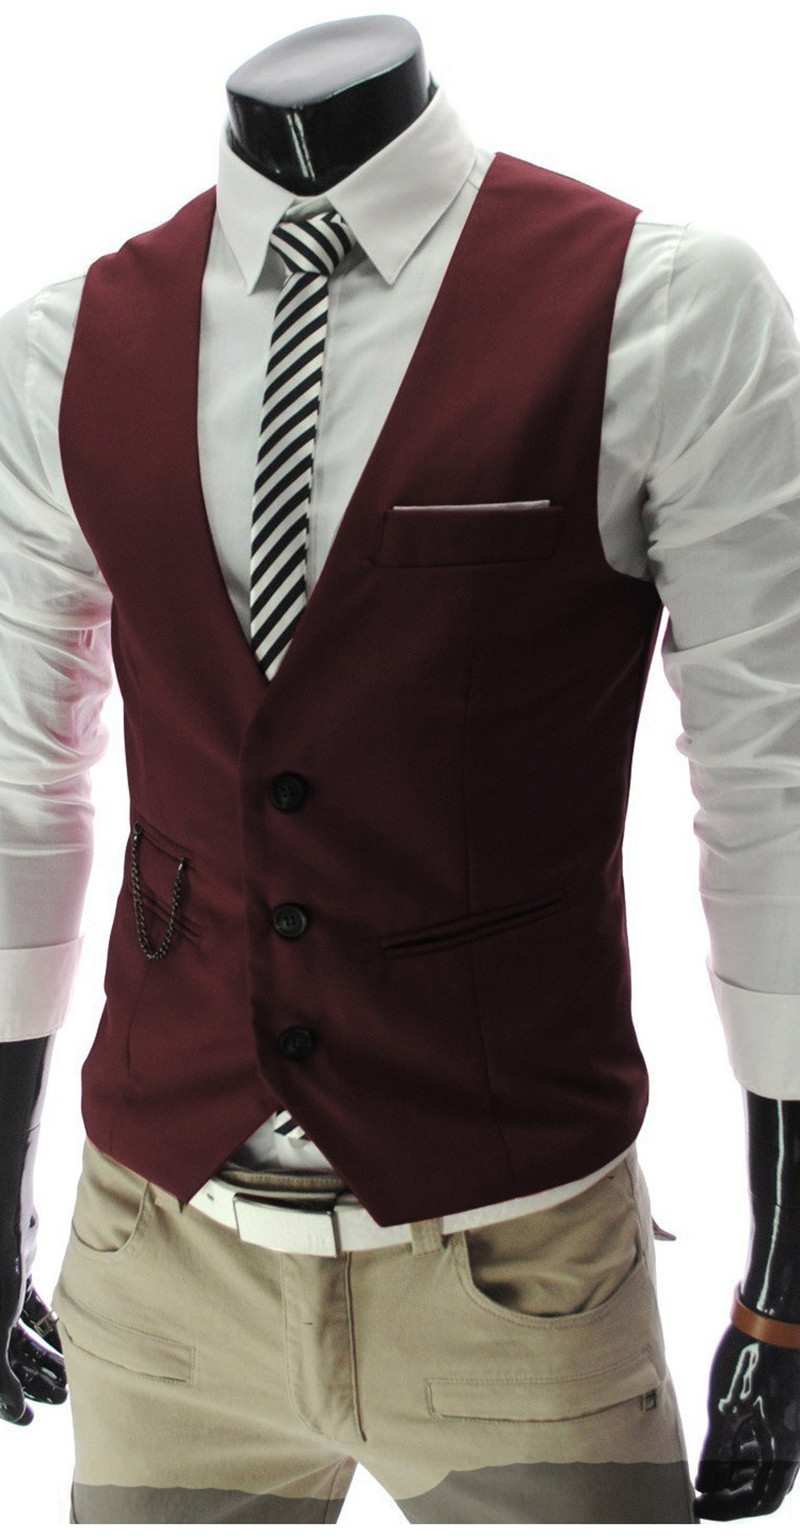 Chaleco de traje Casual para hombre Chaleco Ajustado británico.